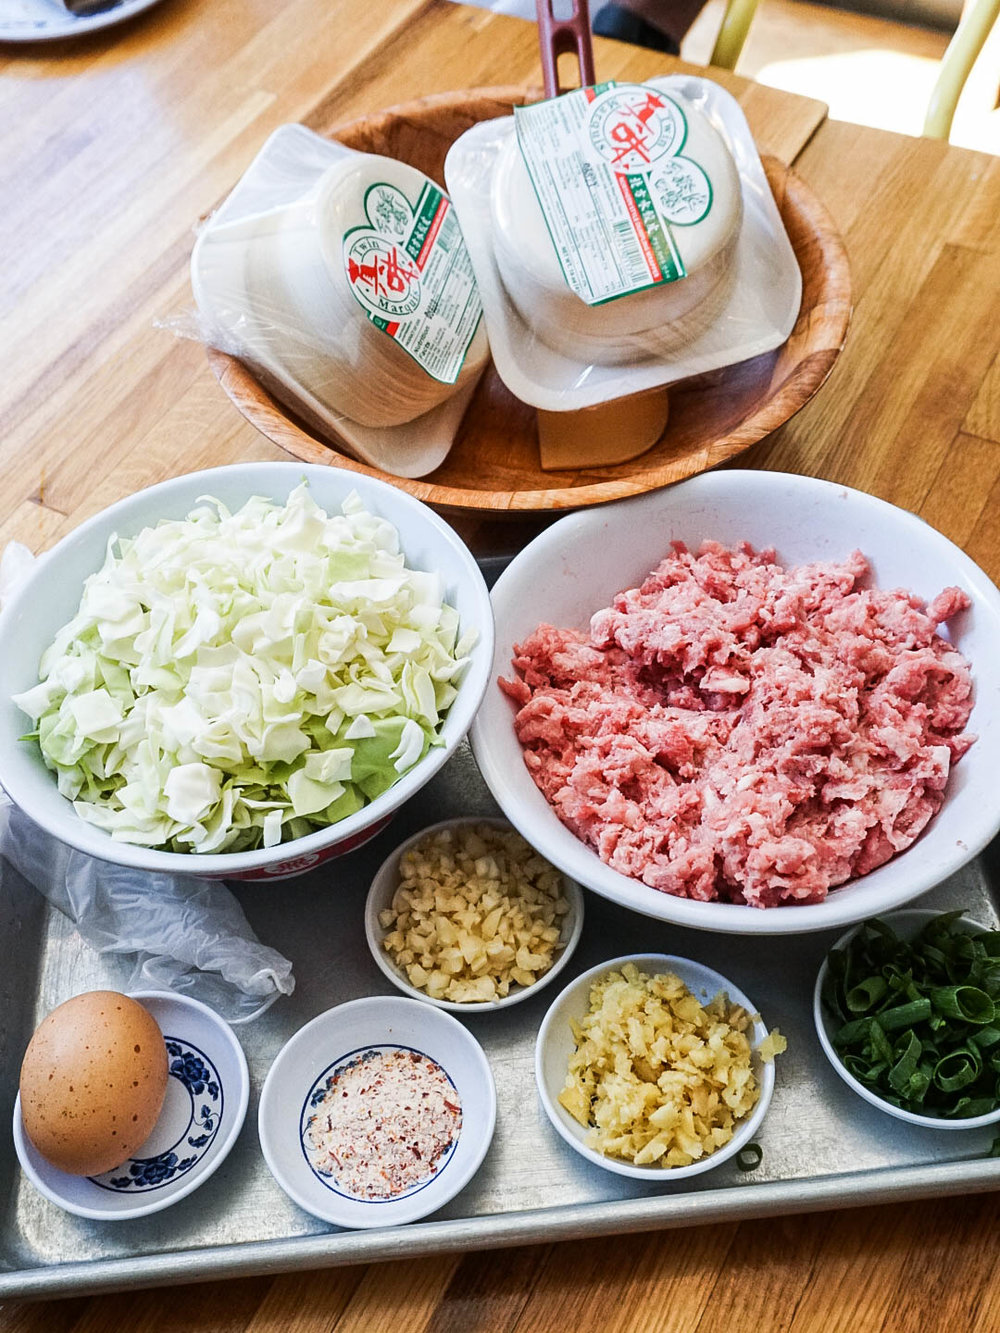 Dumpling Filling Ingredients & Wrapper